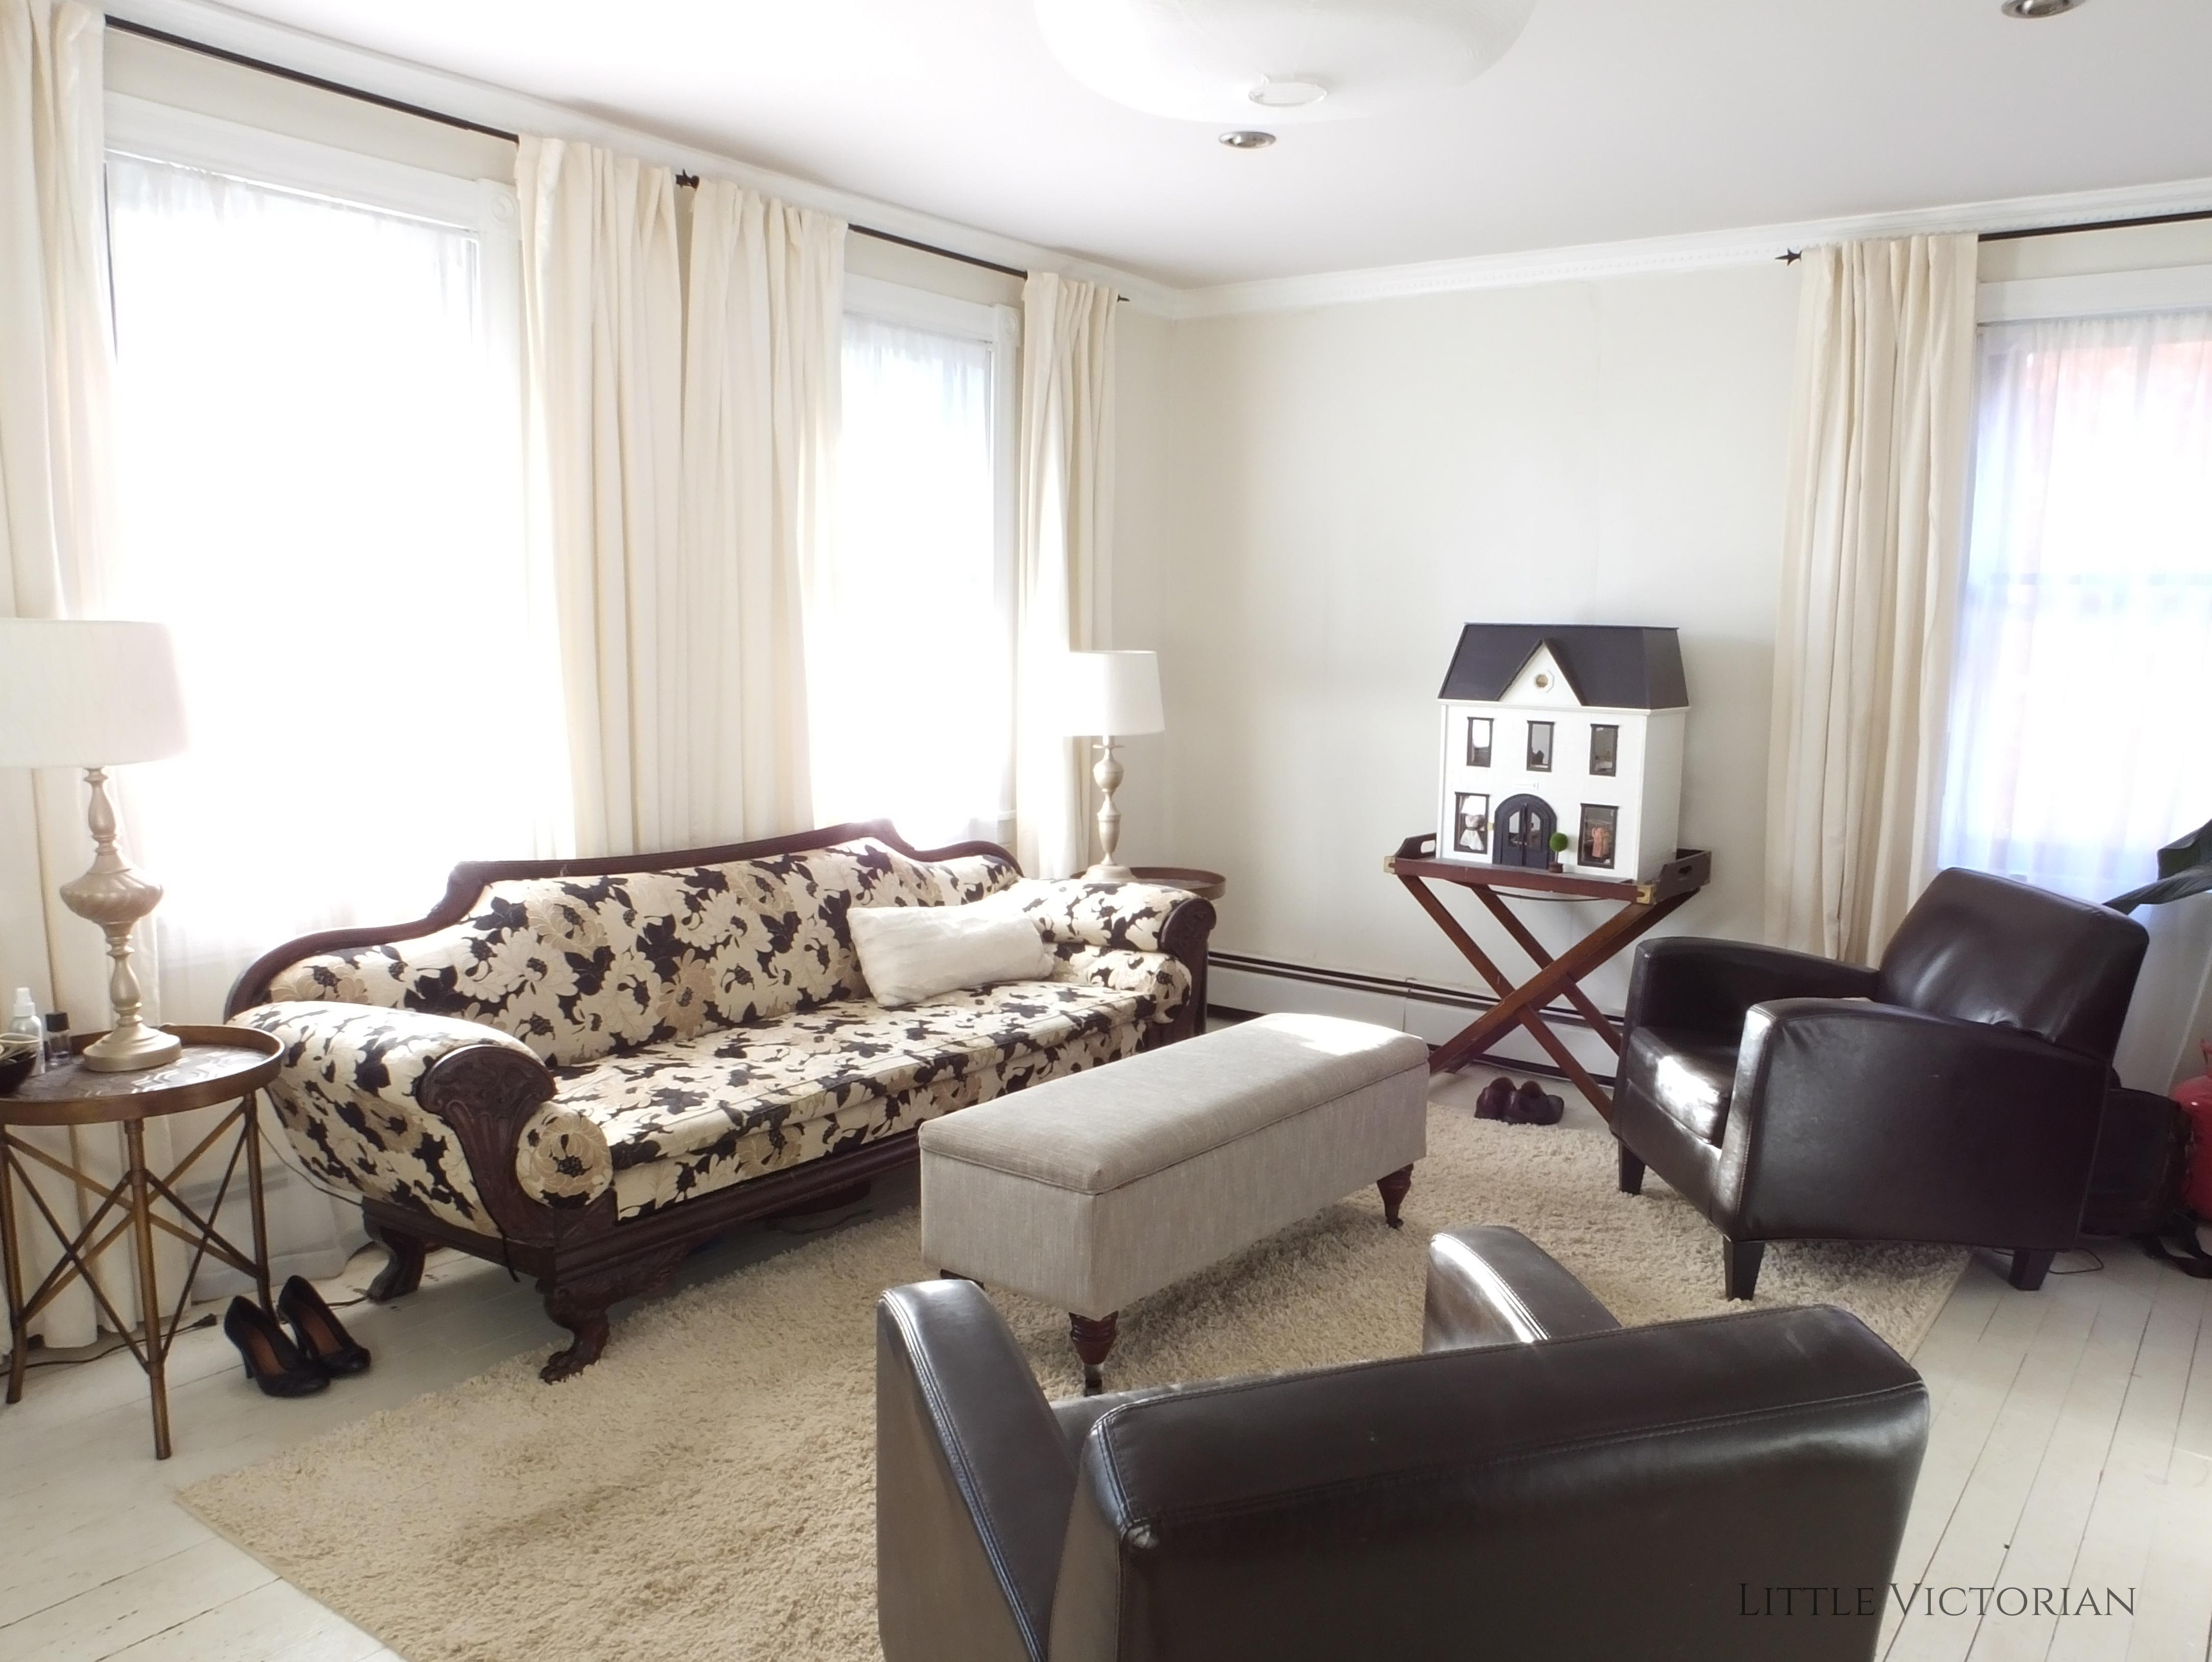 Drastic Living Room Makeover: Second Blog Anniversary Recap · Little Victorian